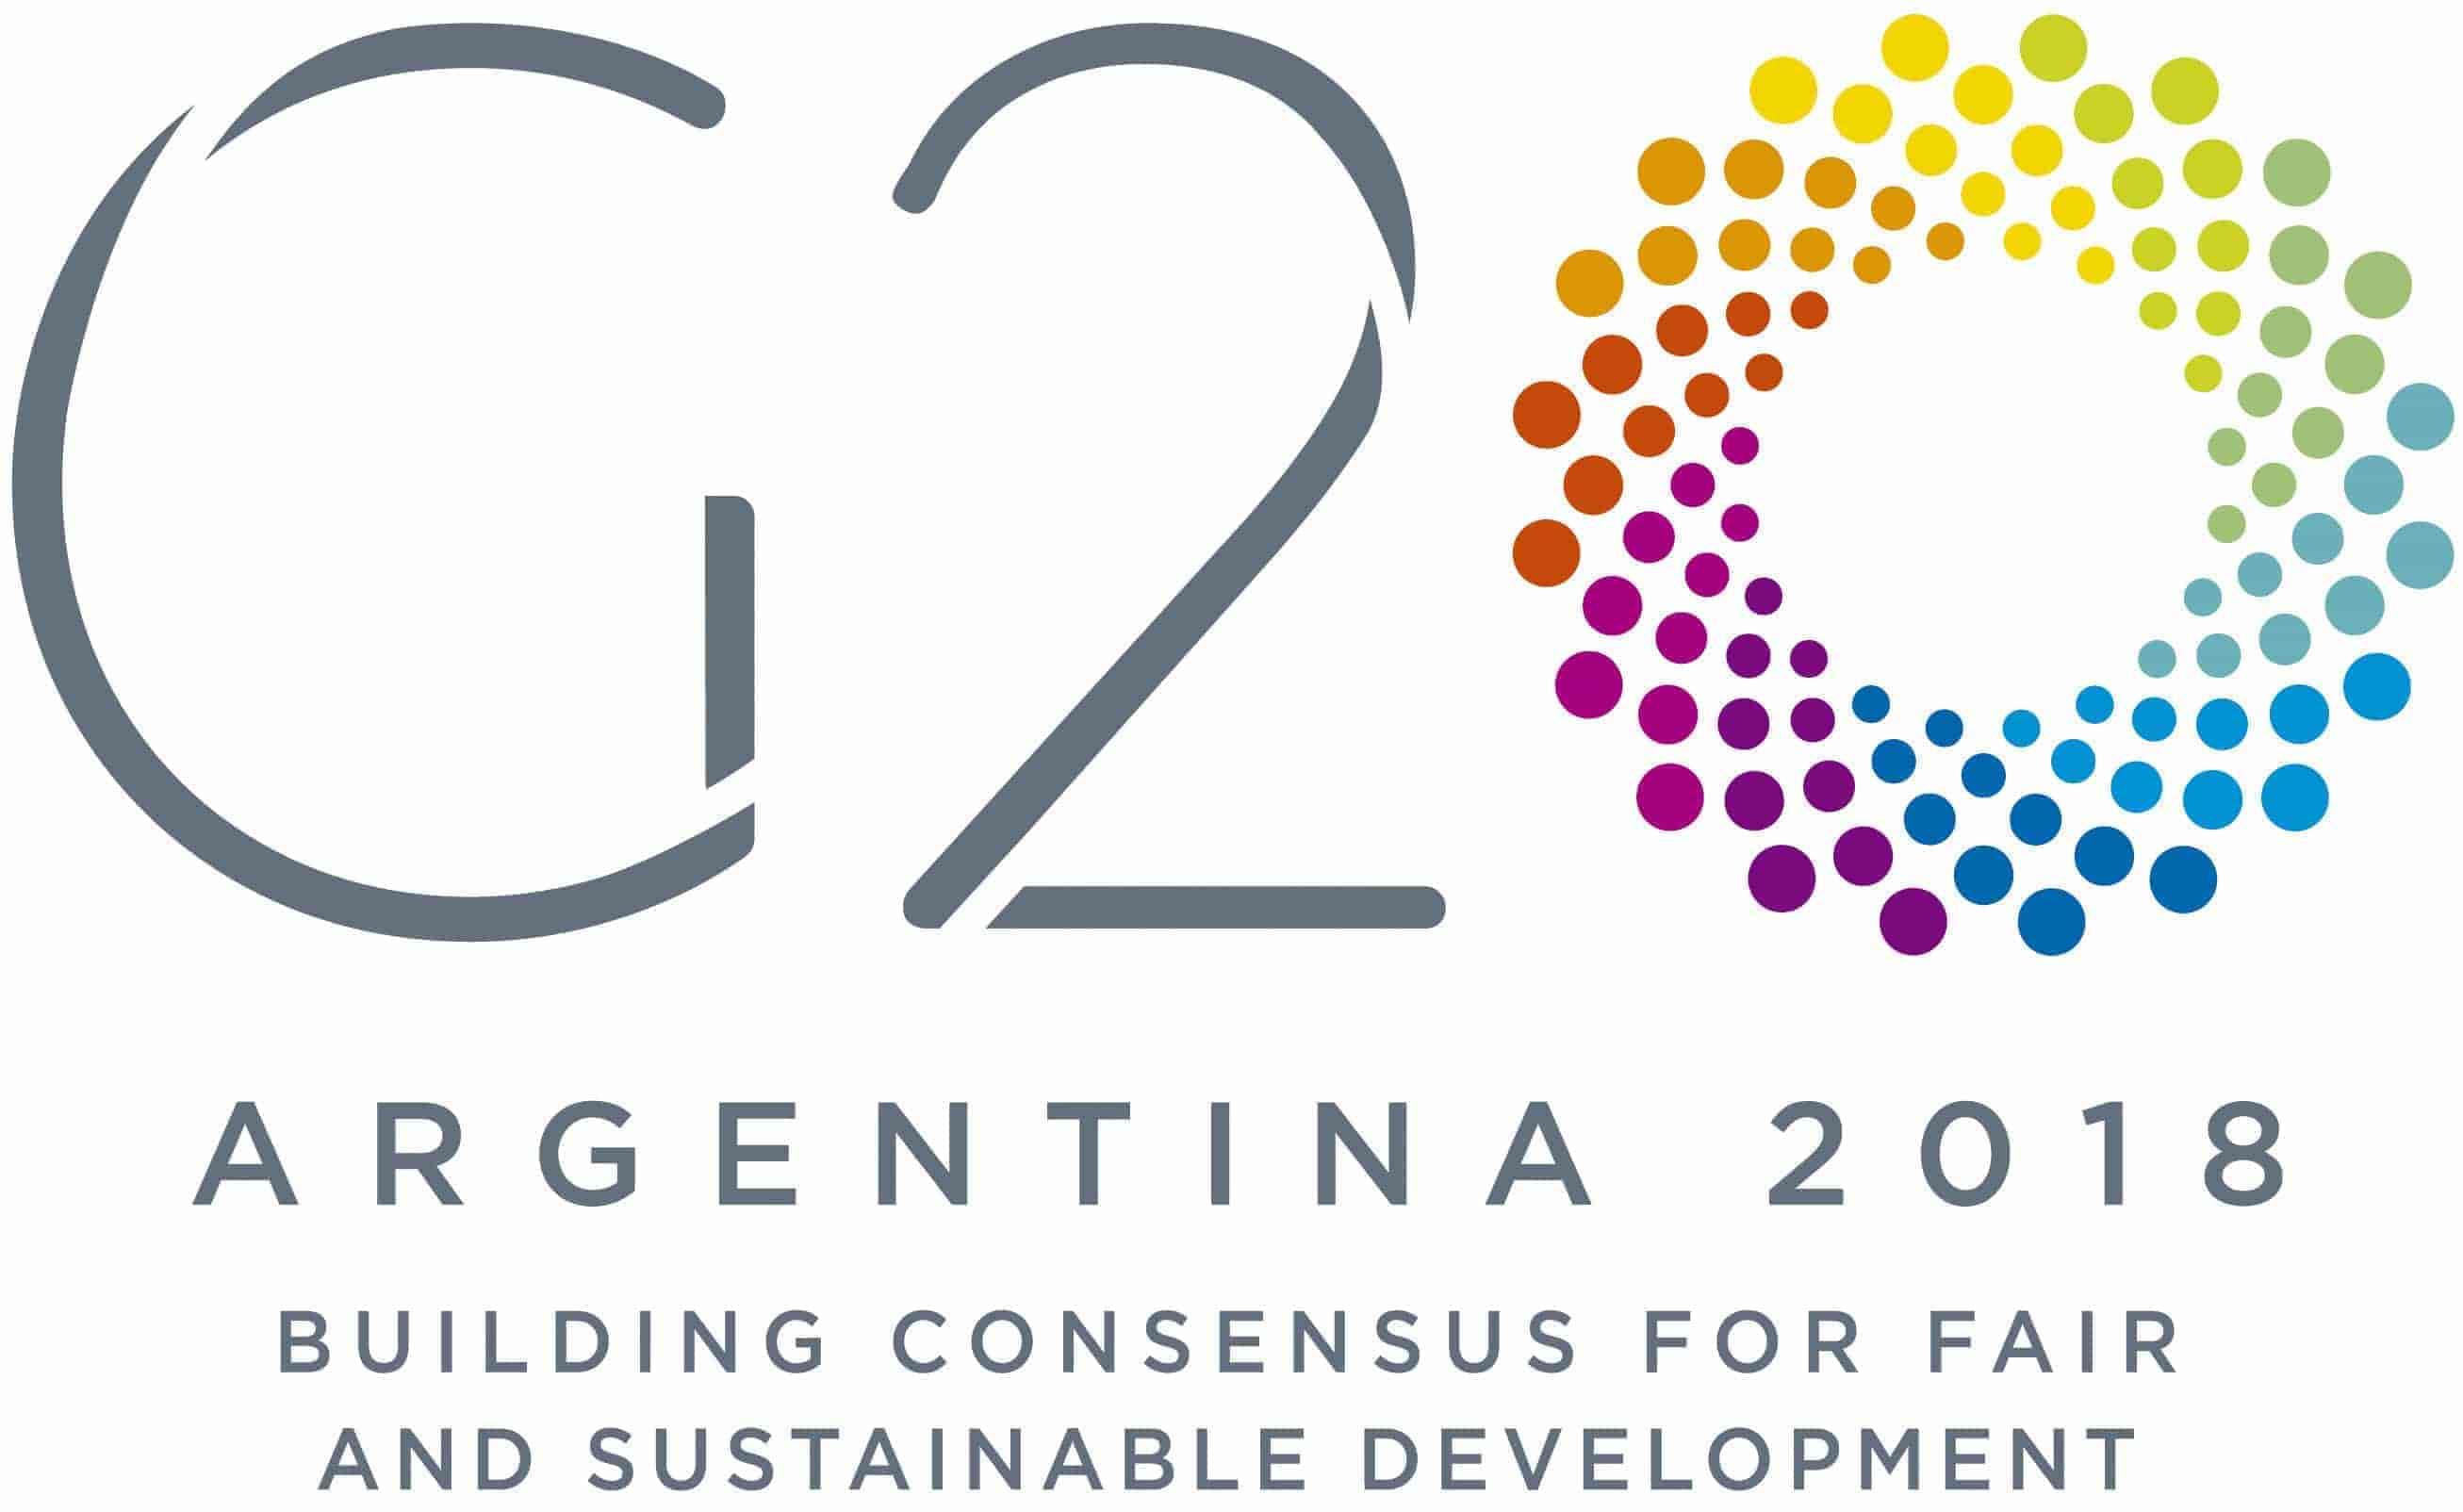 g 20 summit, narendra modi, india,